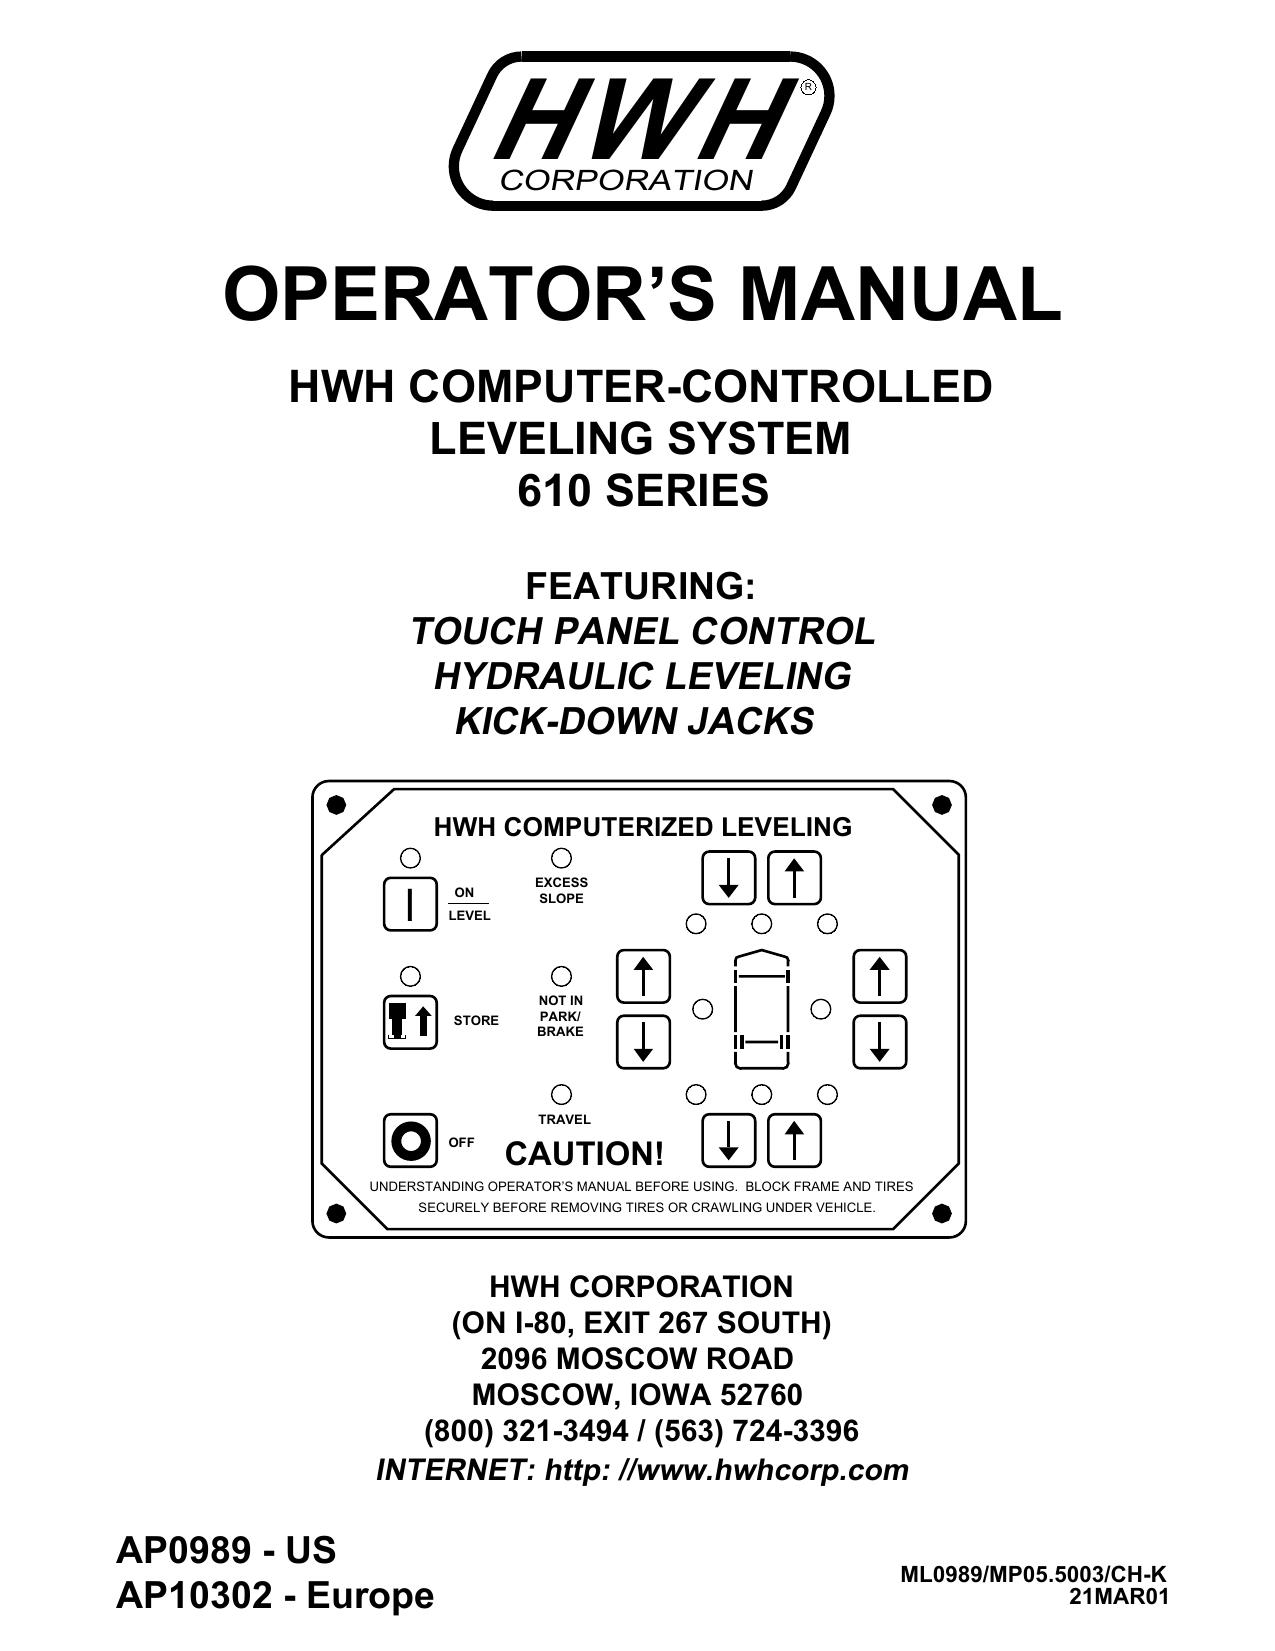 ML0989 - HWH Corporation | manualzz com